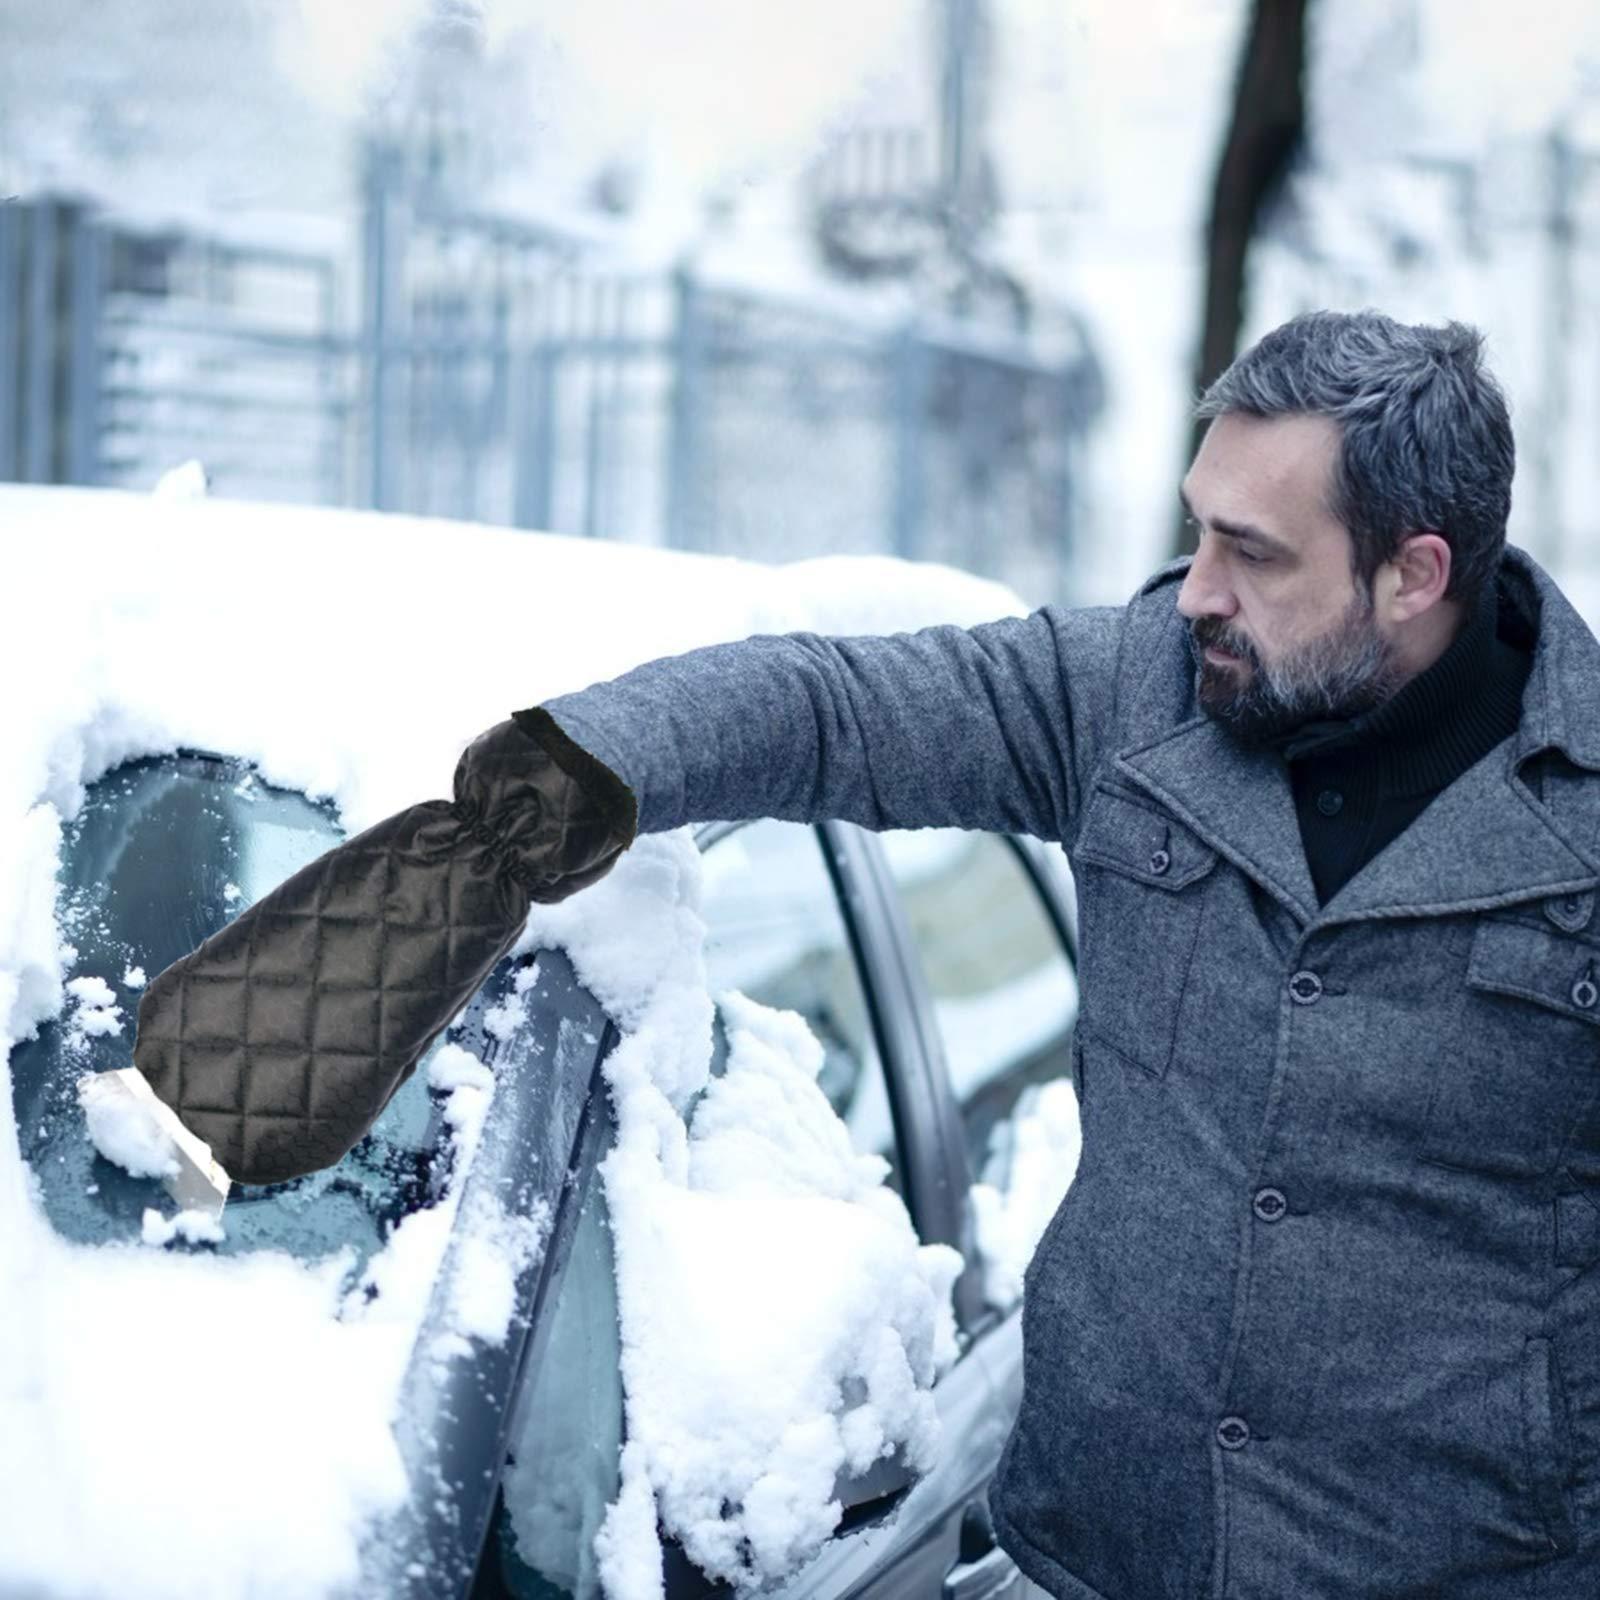 TAZEMAT Snow Scraper with Glove Waterproof Ice Scraper Mitt for Car Windscreen Windshield Window Snow Scraper Removal Glove with Elastic Wristband Antifreeze Ice Scraping Mitten Shovel Tool (Black)